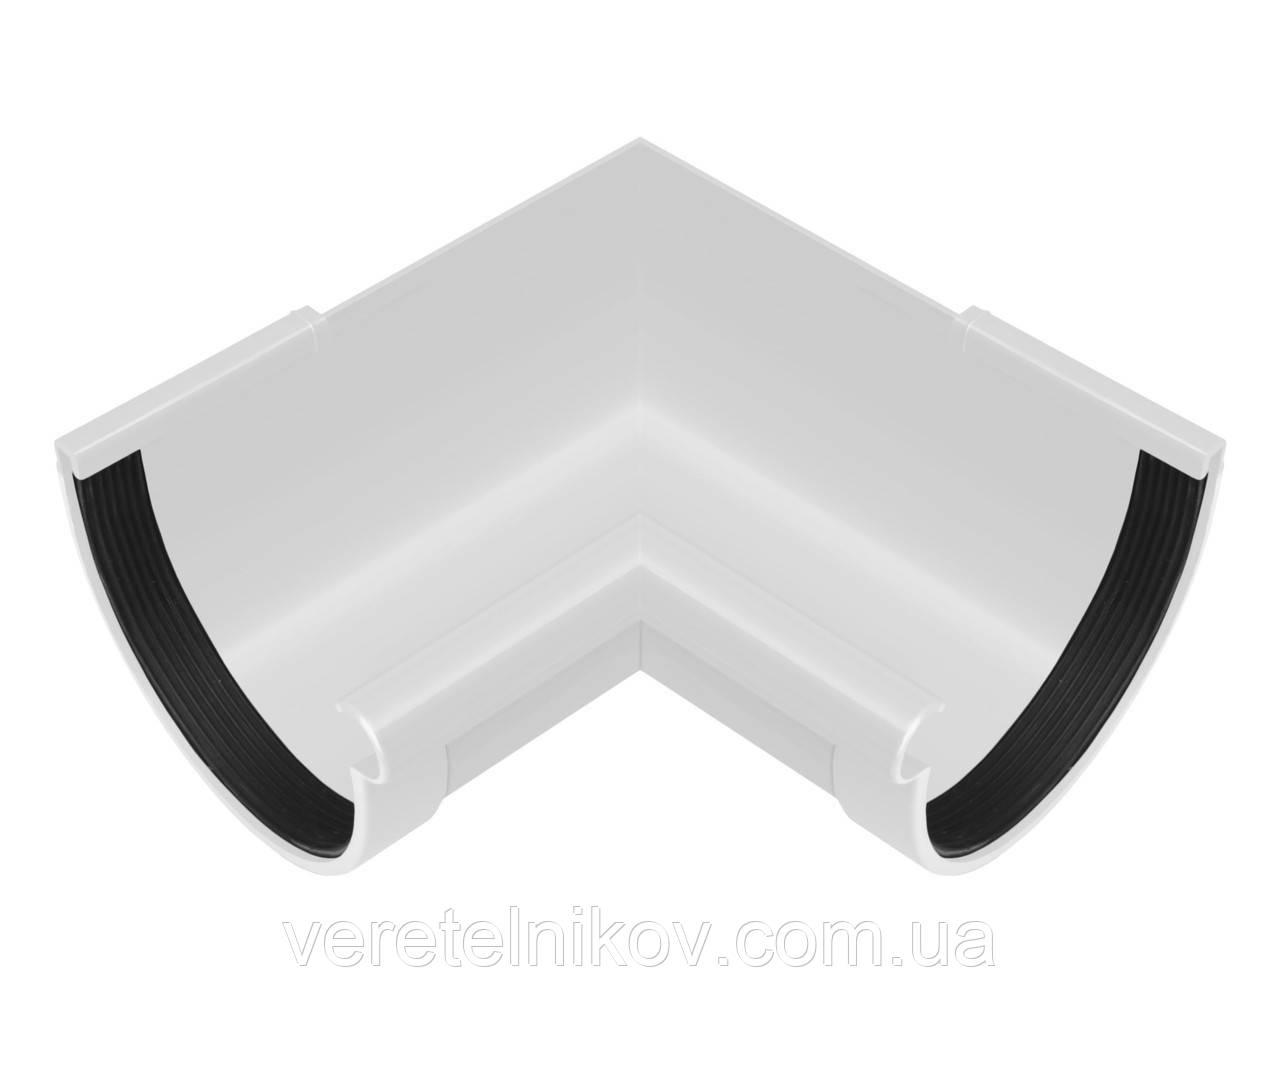 Угол желоба внутренний 130/100 Ренвей (Rainway) 90°